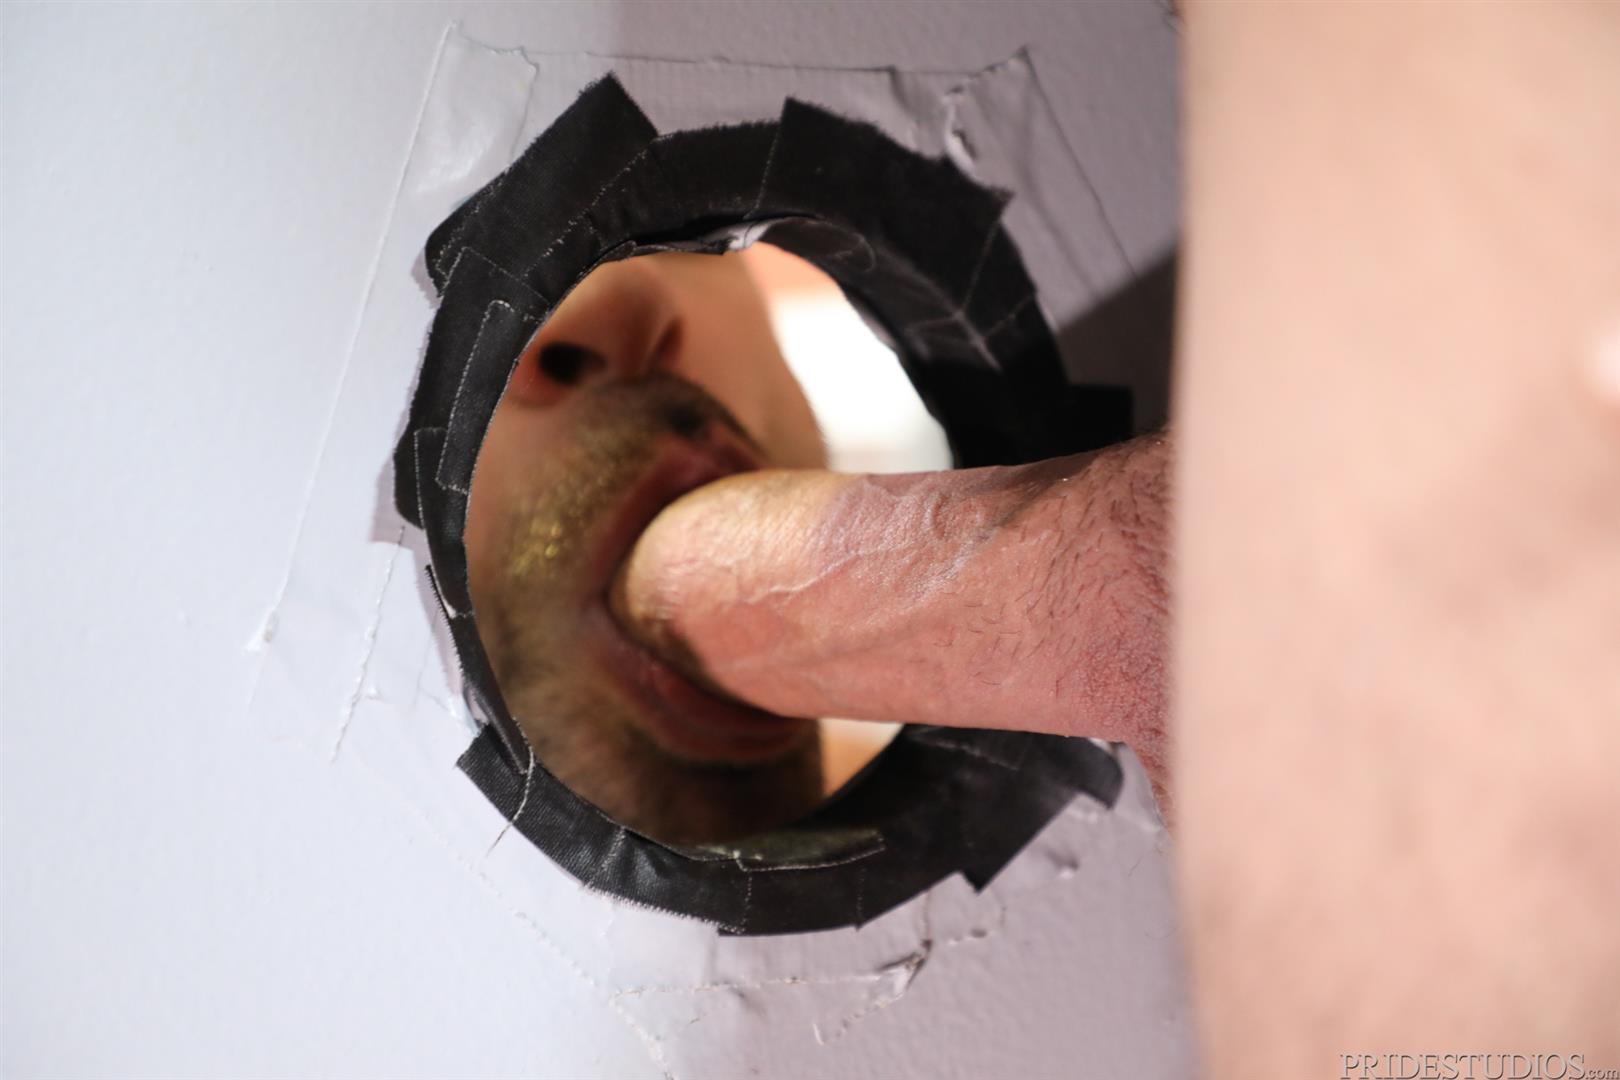 Men-Over-30-Ricky-Larkin-and-Jaxx-Thanatos-Sucking-and-Fucking-At-A-Glory-Hole-08 Hairy Muscle Hunk Jaxx Thanatos Sucks Cock And Gets His Ass Fucked Through A Glory Hole